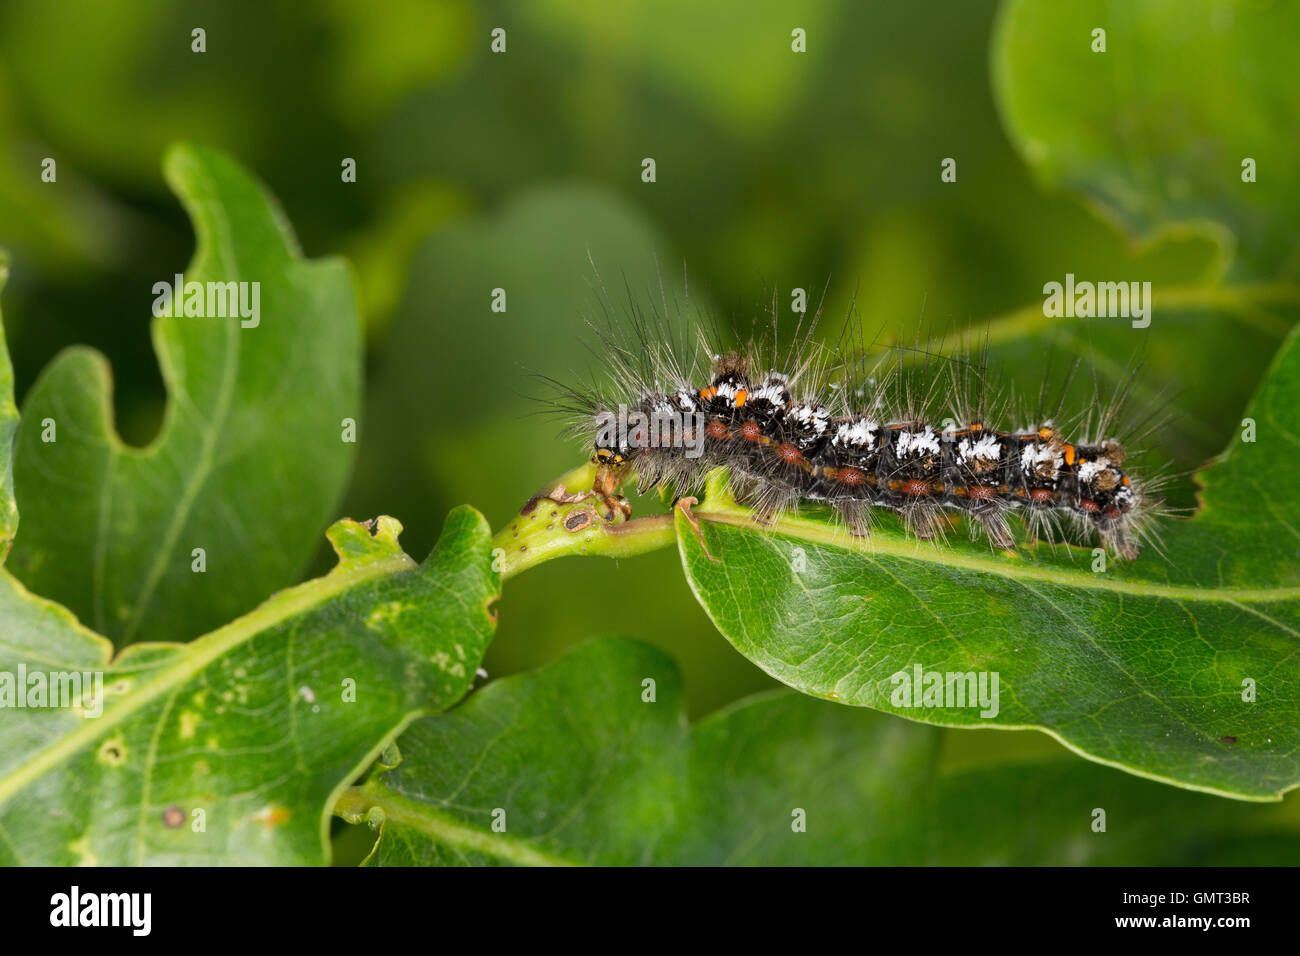 Schwan, Raupe, Euproctis Similis, Porthesia Similis, Sphrageidus Similis, gelb-Leitwerk, Gold-Tail, Goldtail Motte, Stockbild